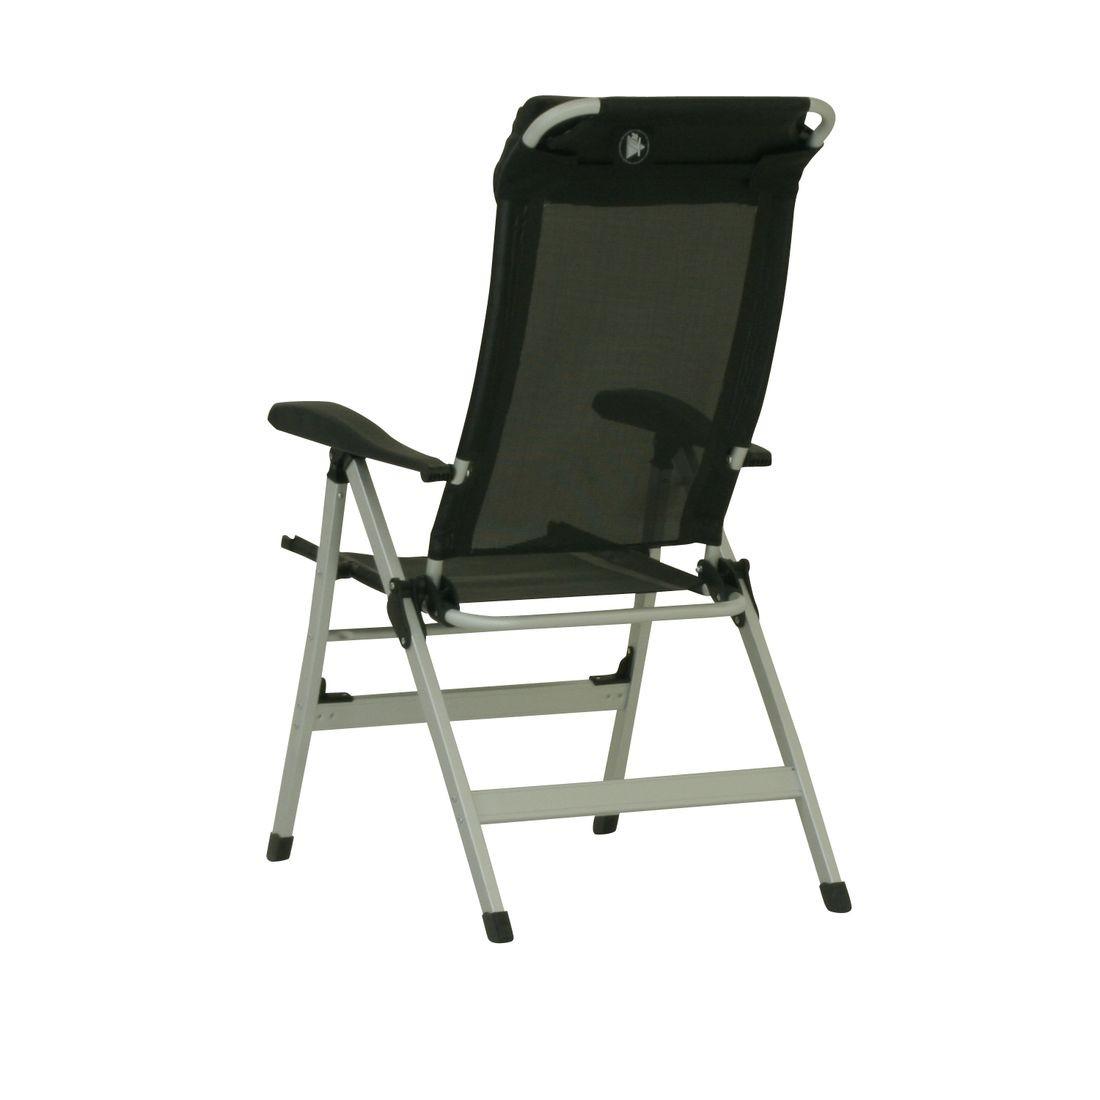 10t easychair aluminium camping chair high back incl